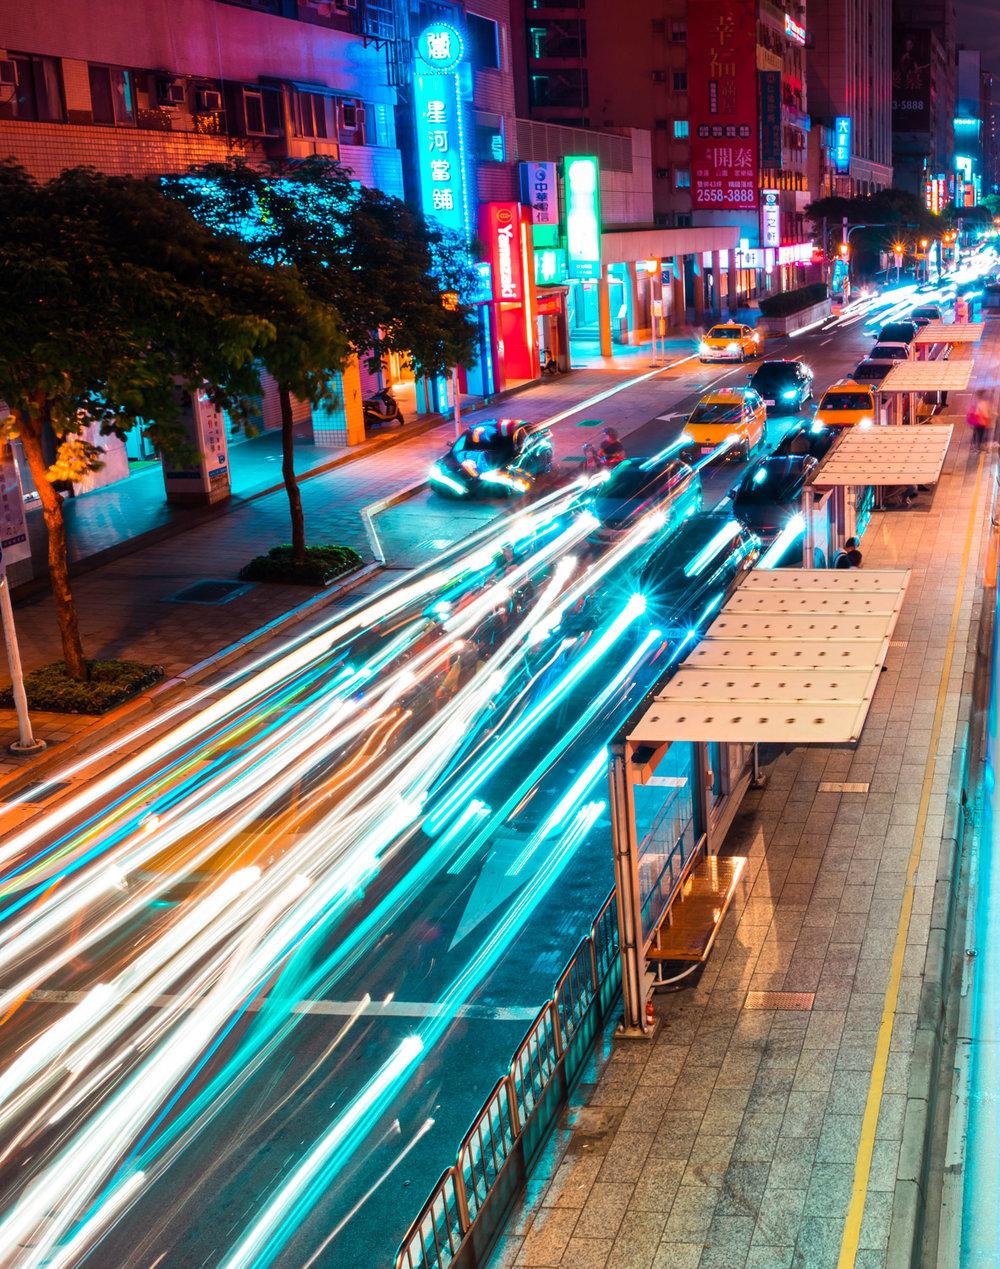 amaris-woo-photography-taipei-taiwan-long-exposure